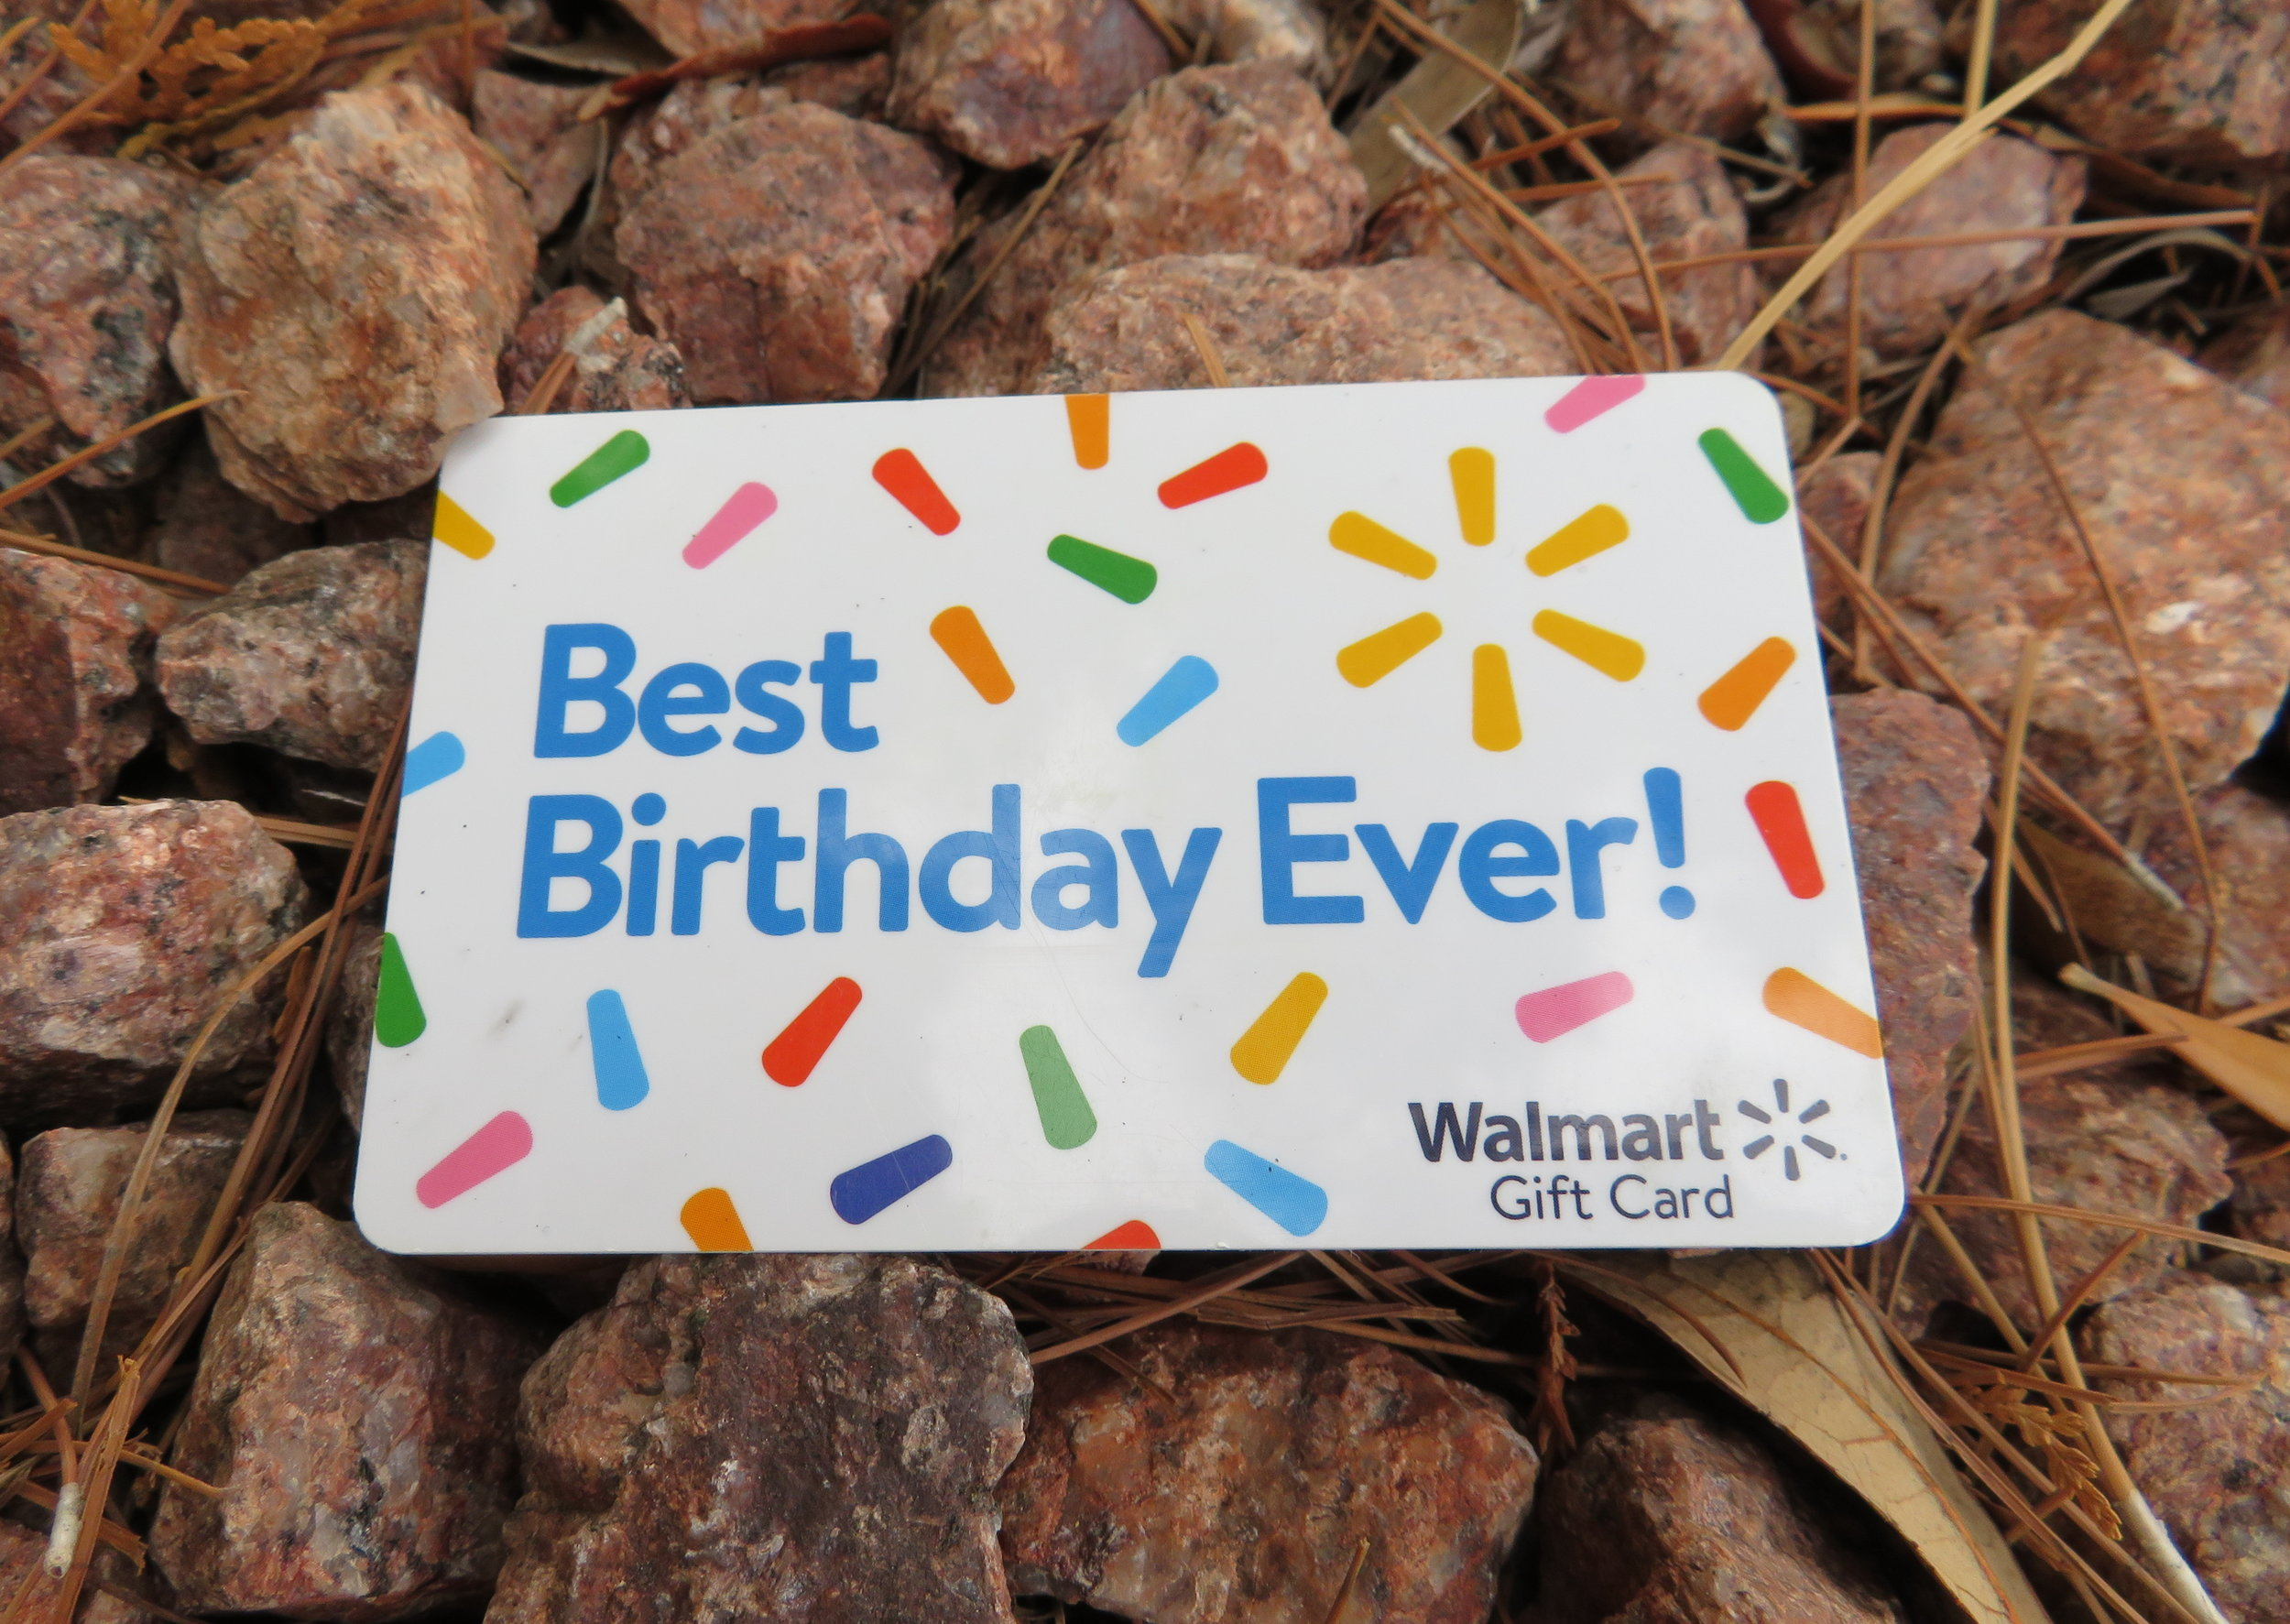 penny_gift card.JPG